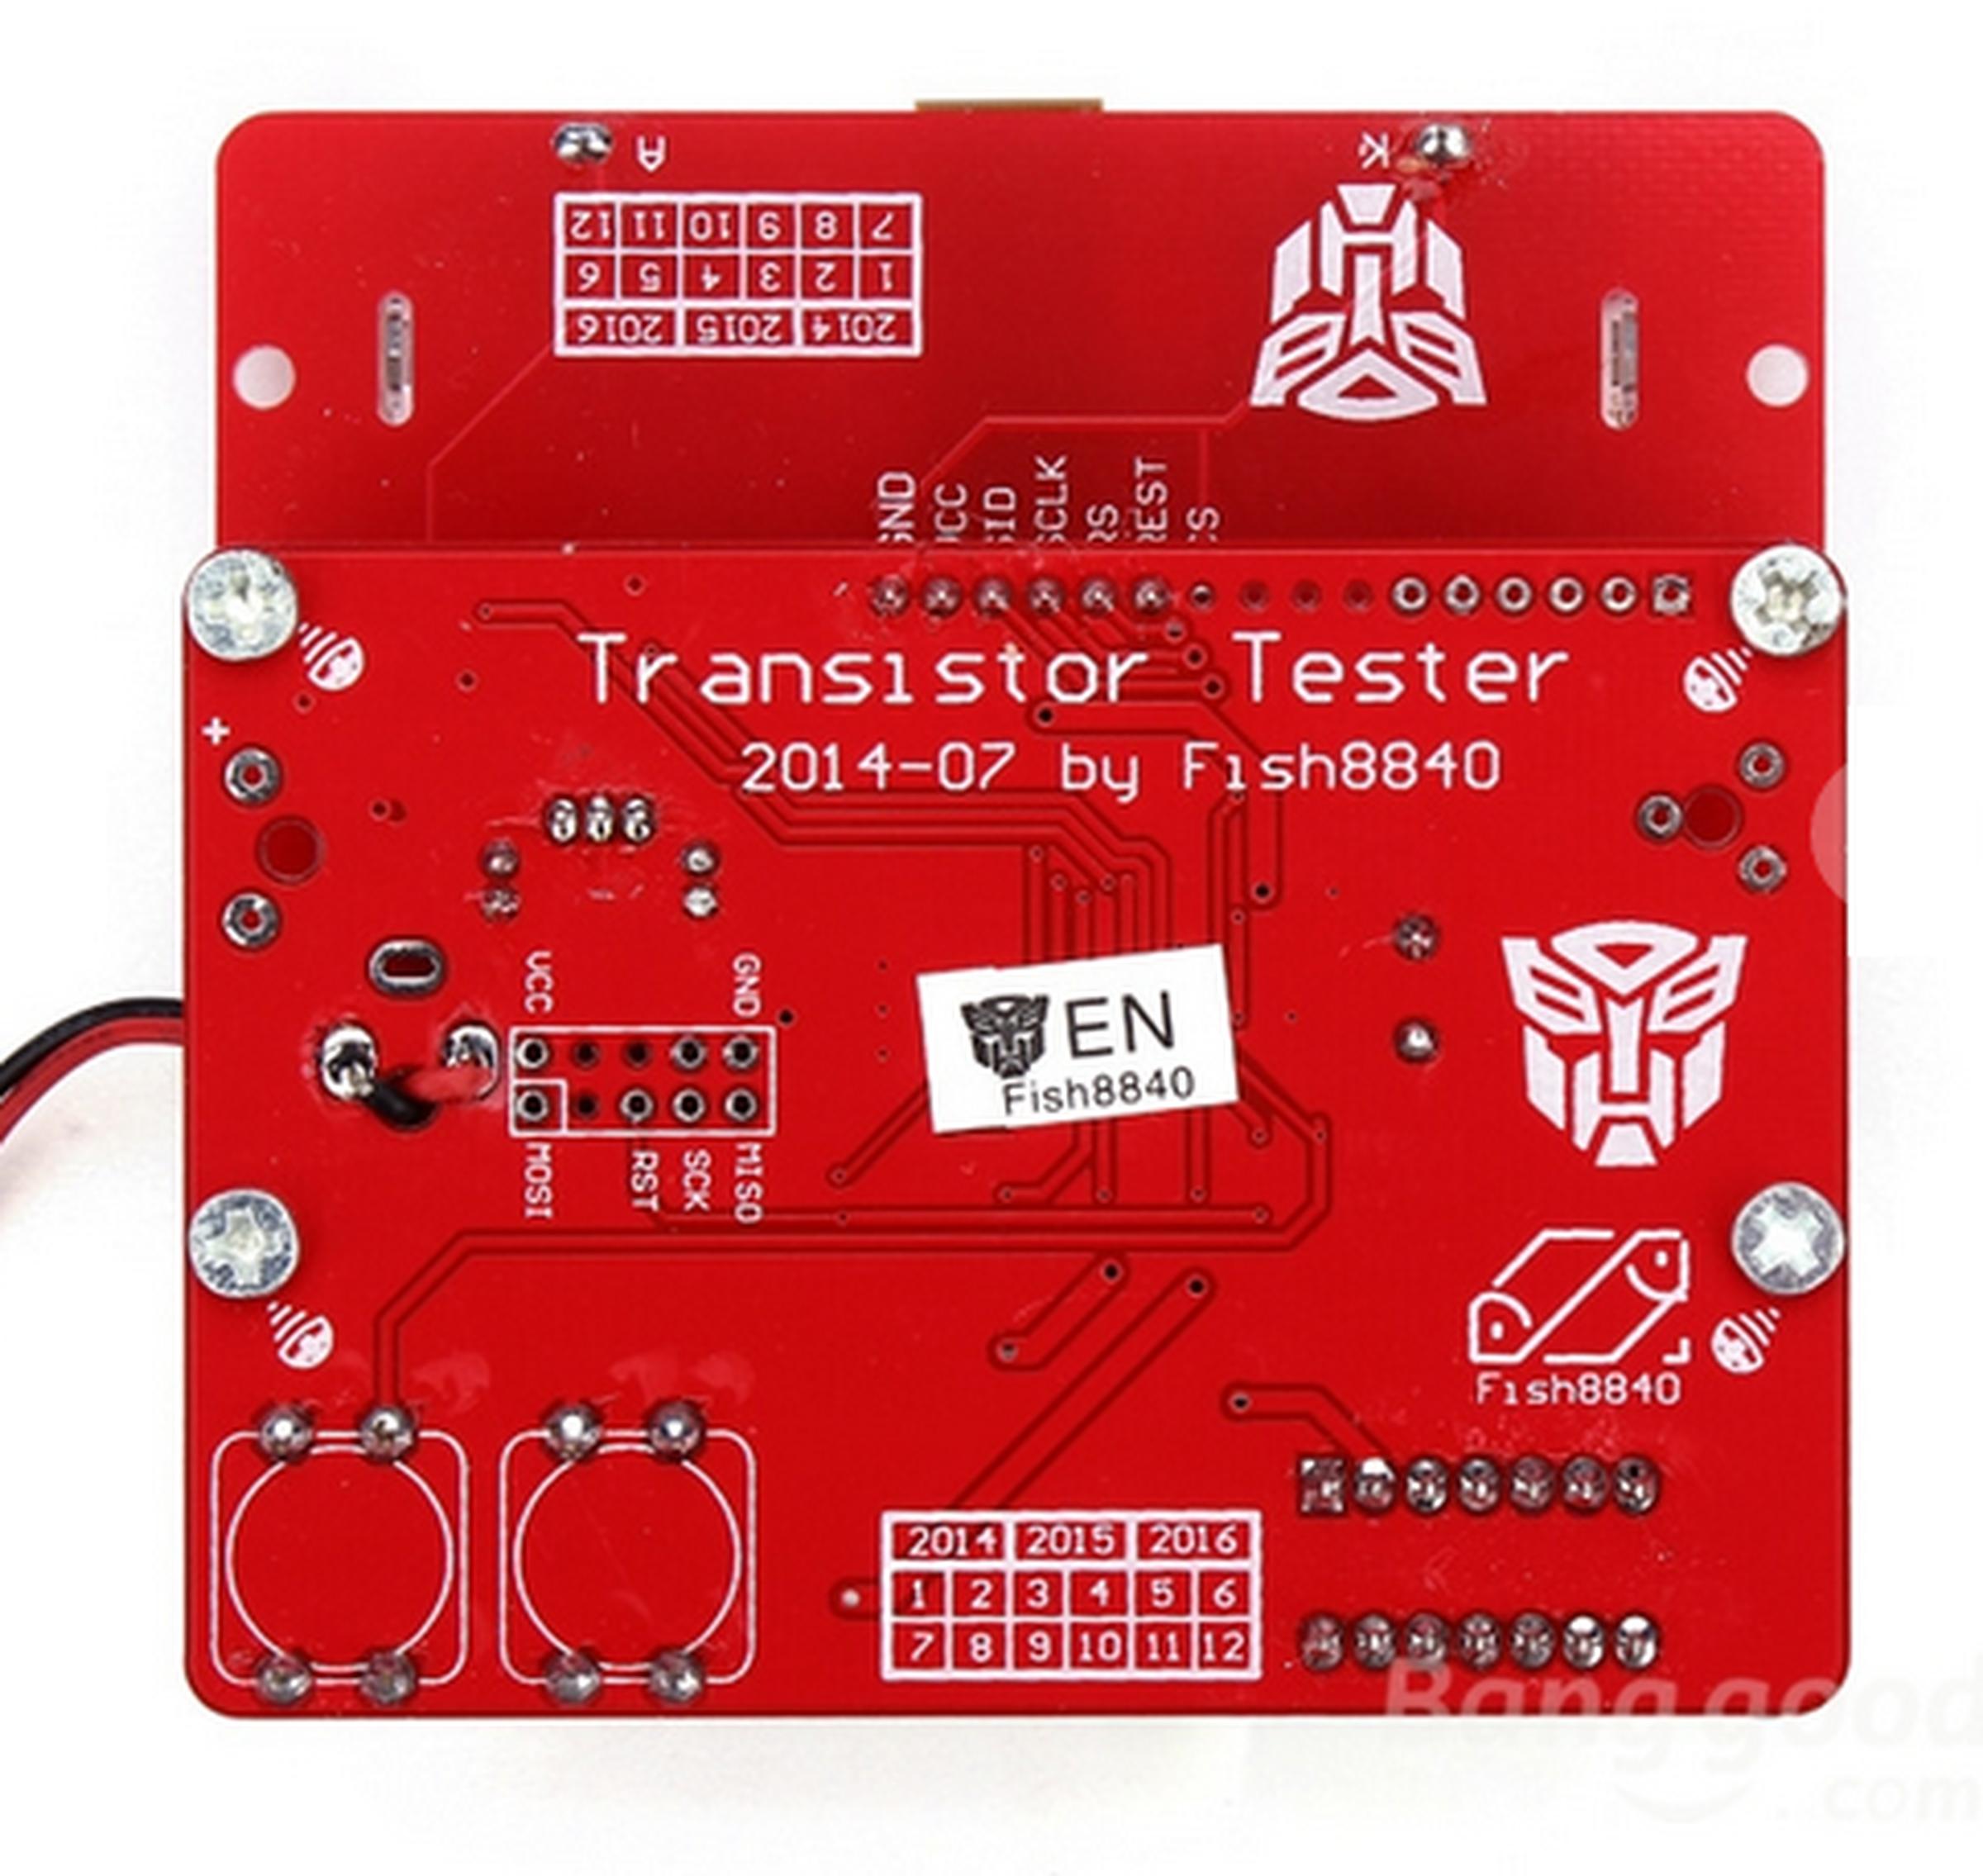 12864 Lcd Mega328 Transistor Tester Capacitance Esr Meter Diode Auto Lcr Digital Electric Bridge Resistance Inductance Triode Mos Pnp 5